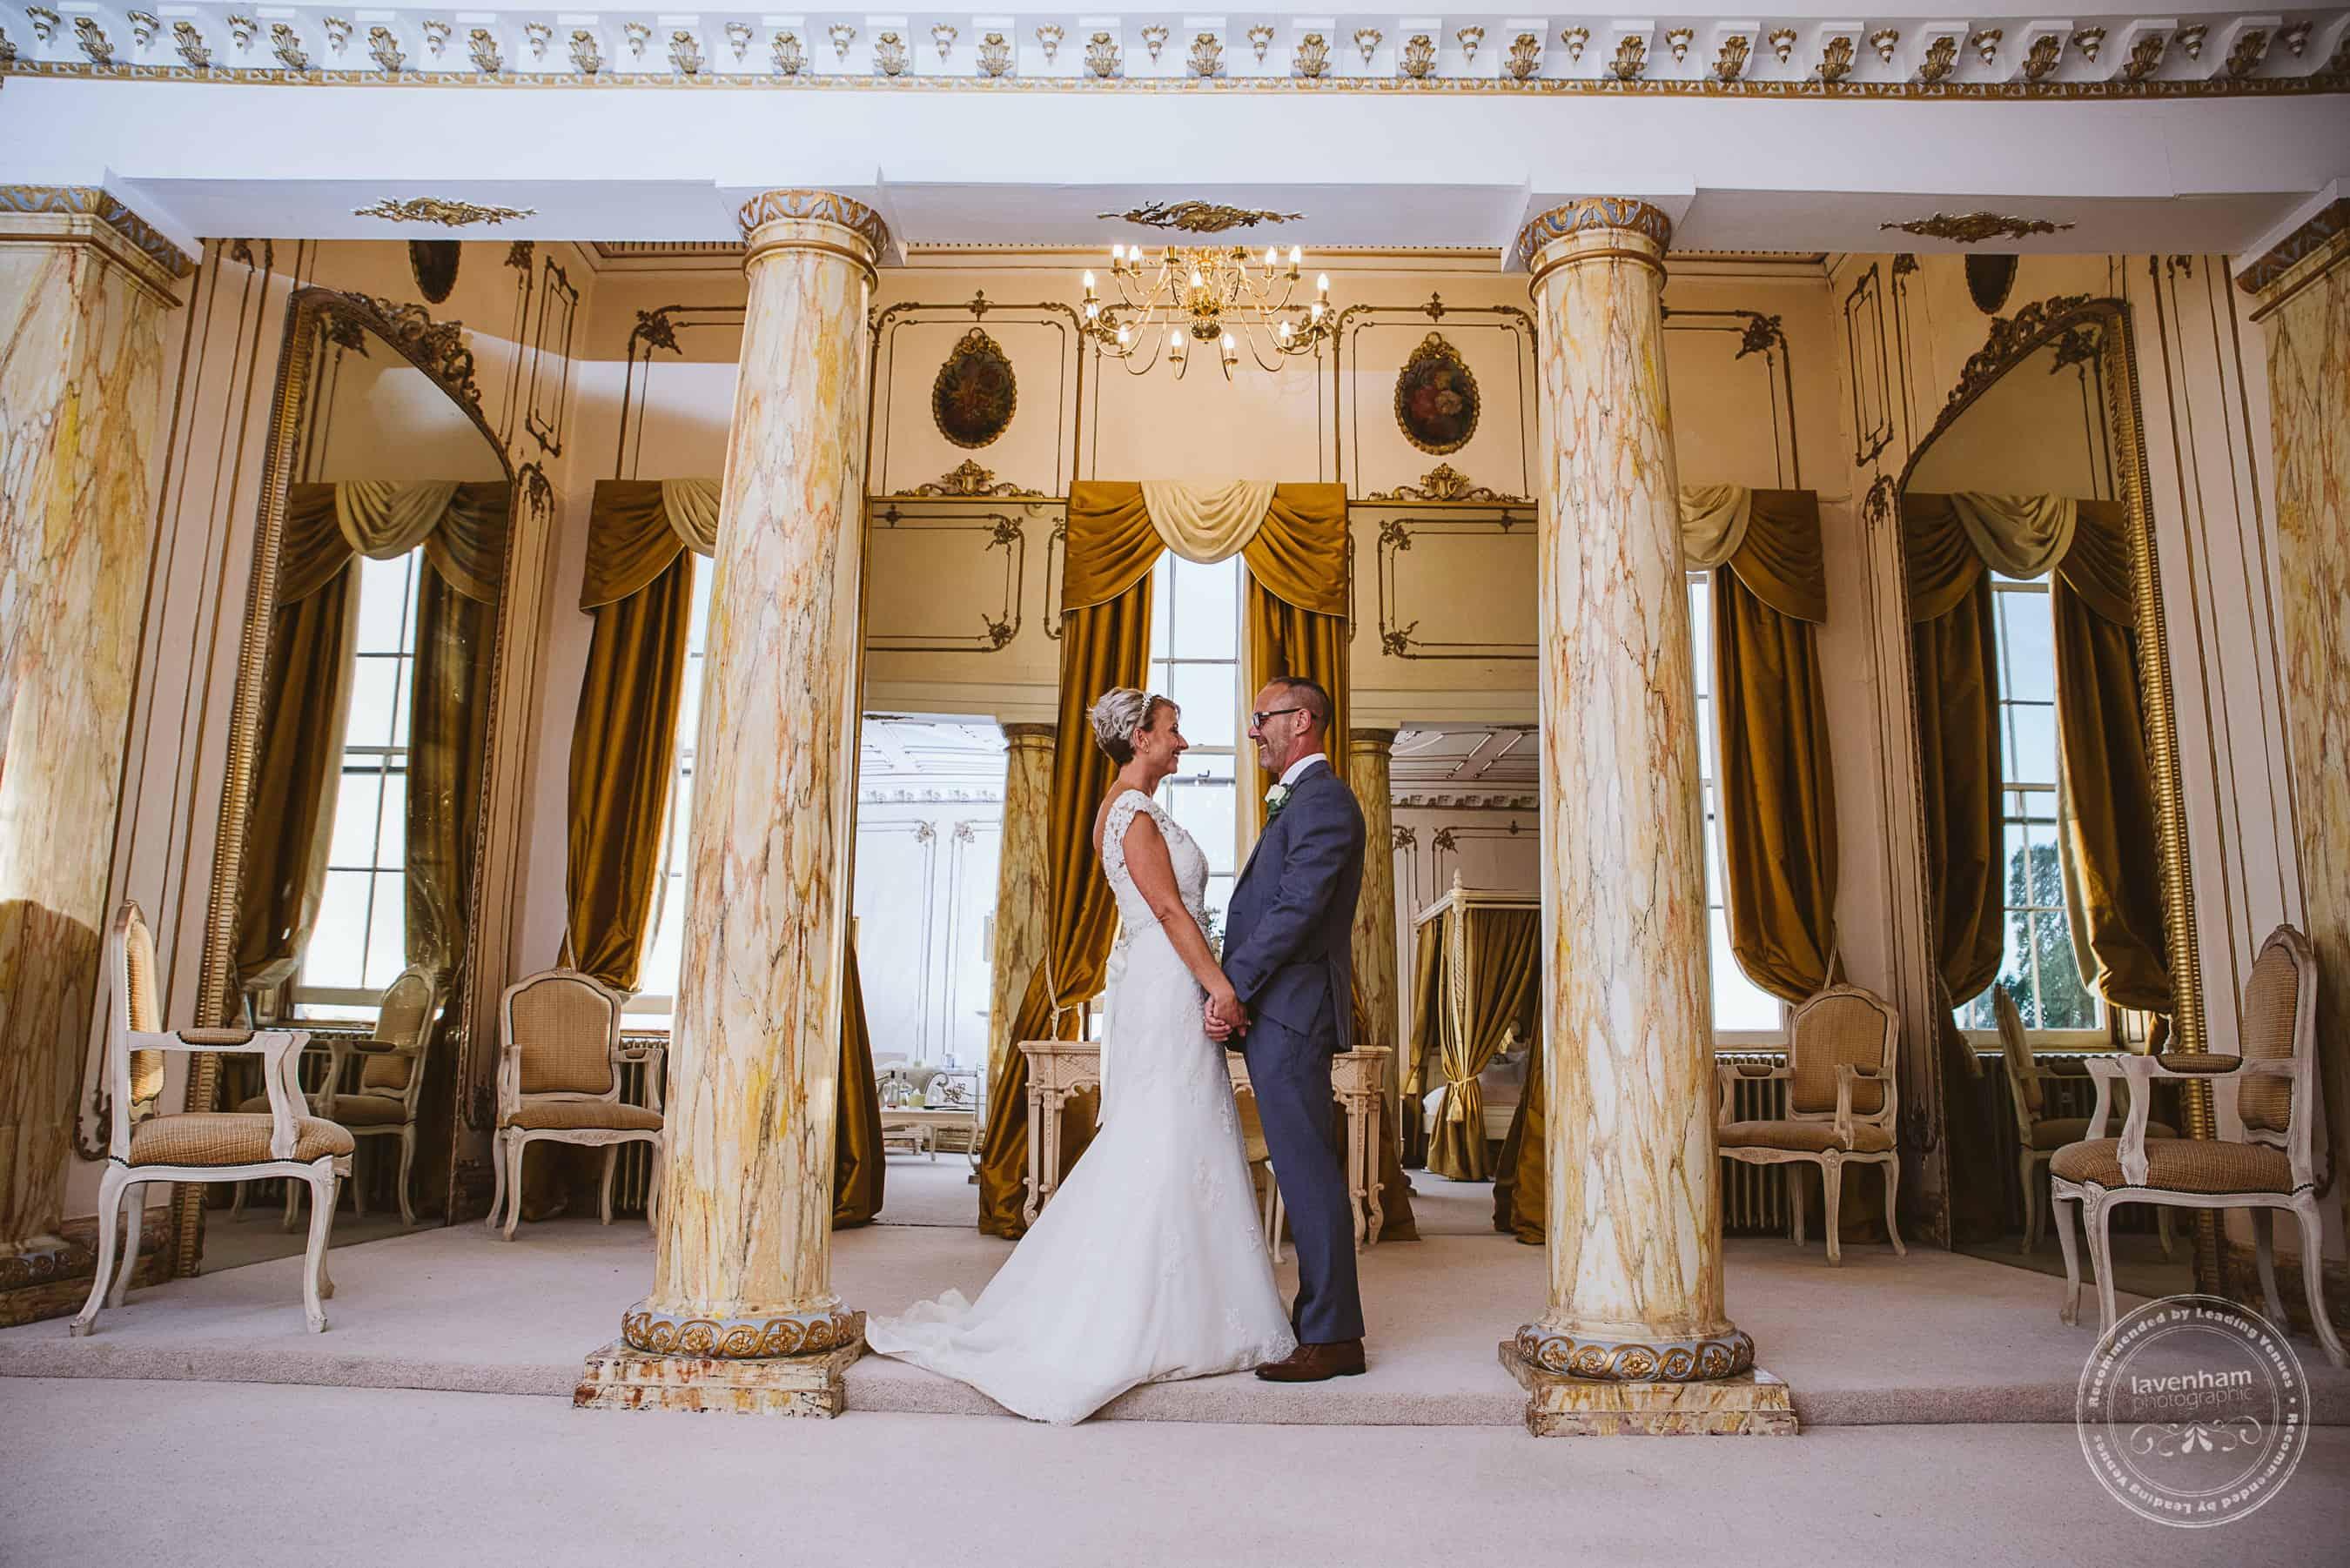 281018 Gosfield Hall Wedding Photography Lavenham Photographic 099